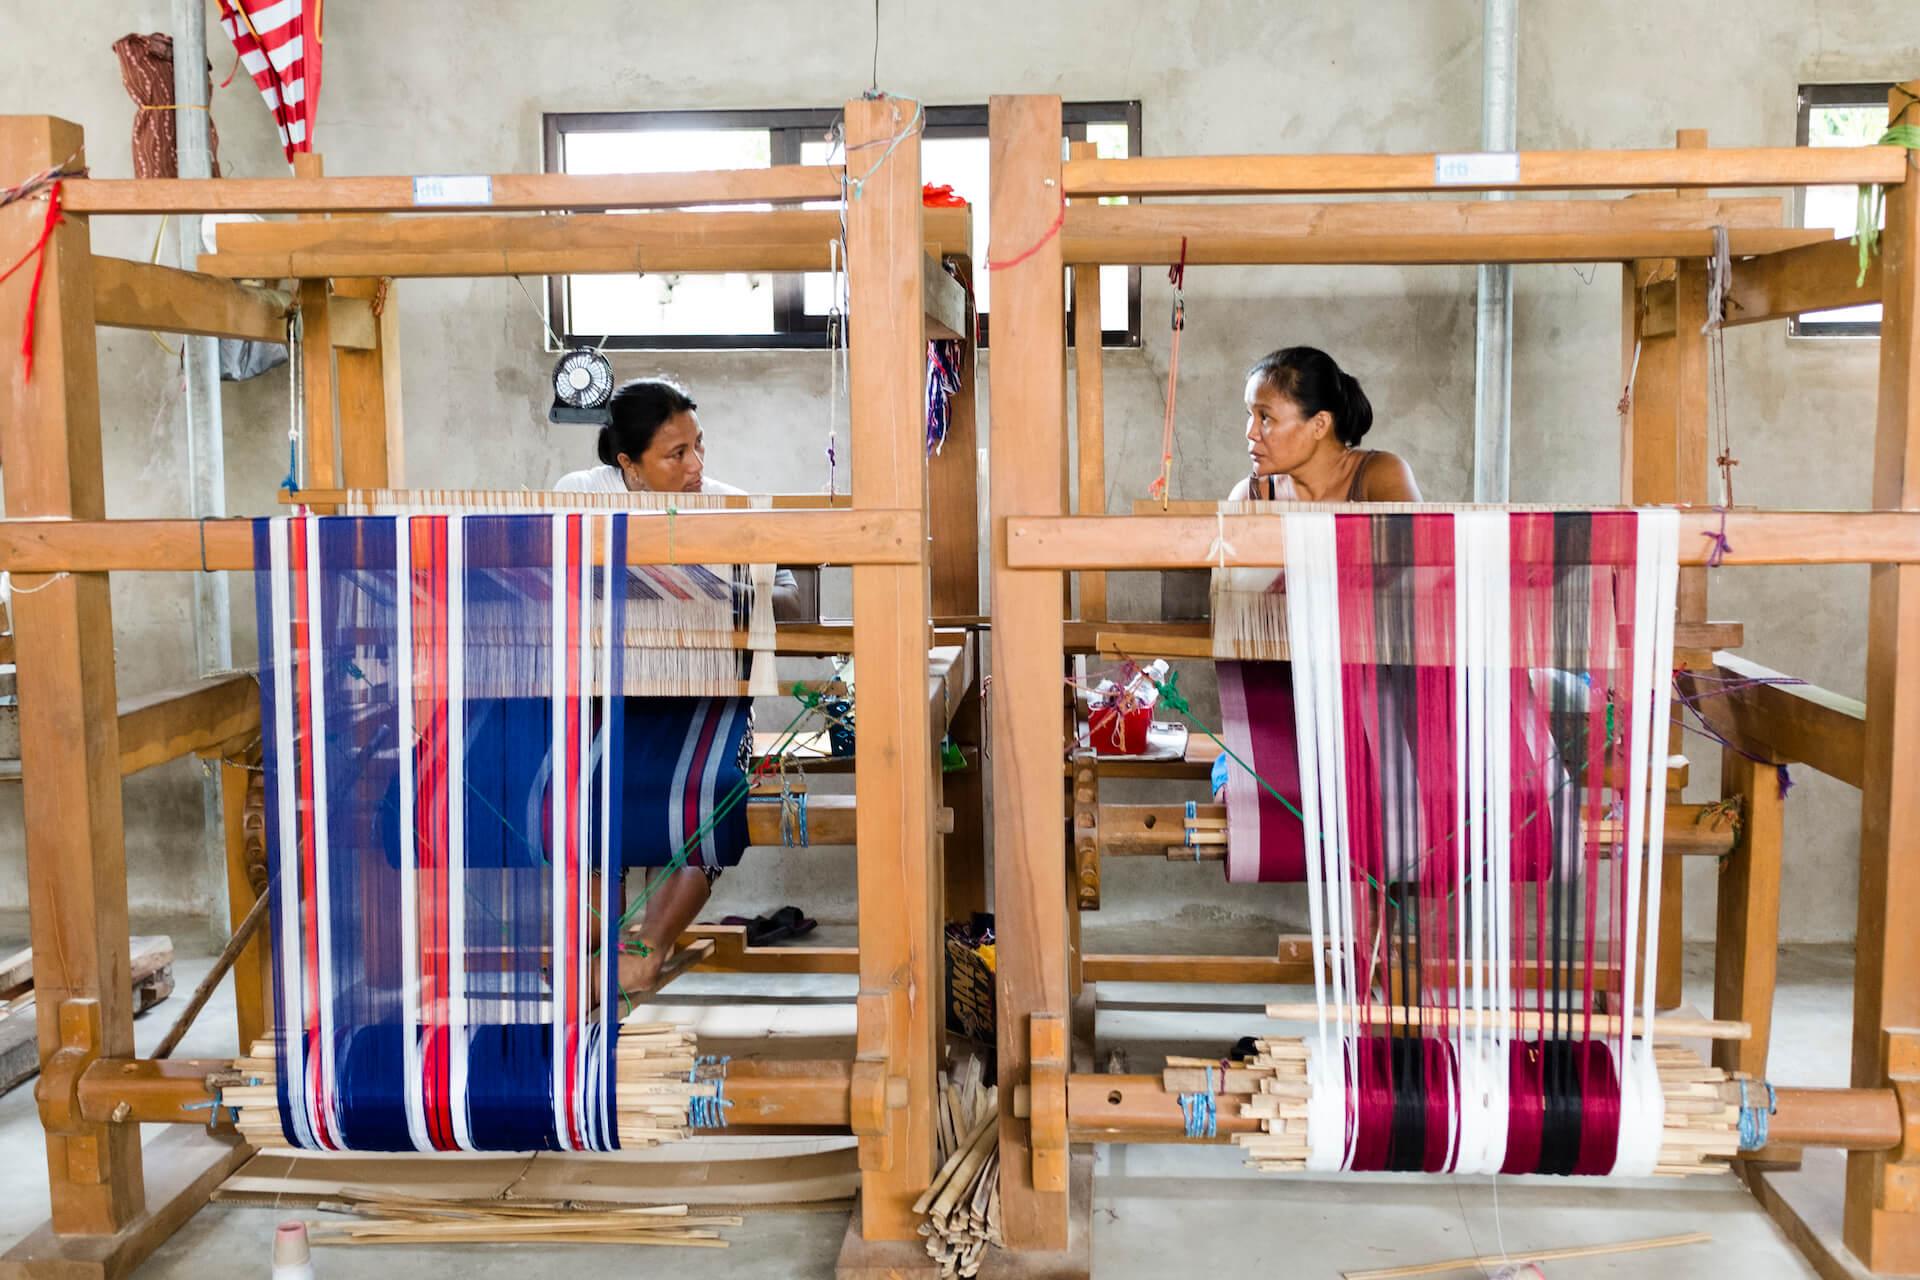 ANTHILL weavers sit behind upright floor looms